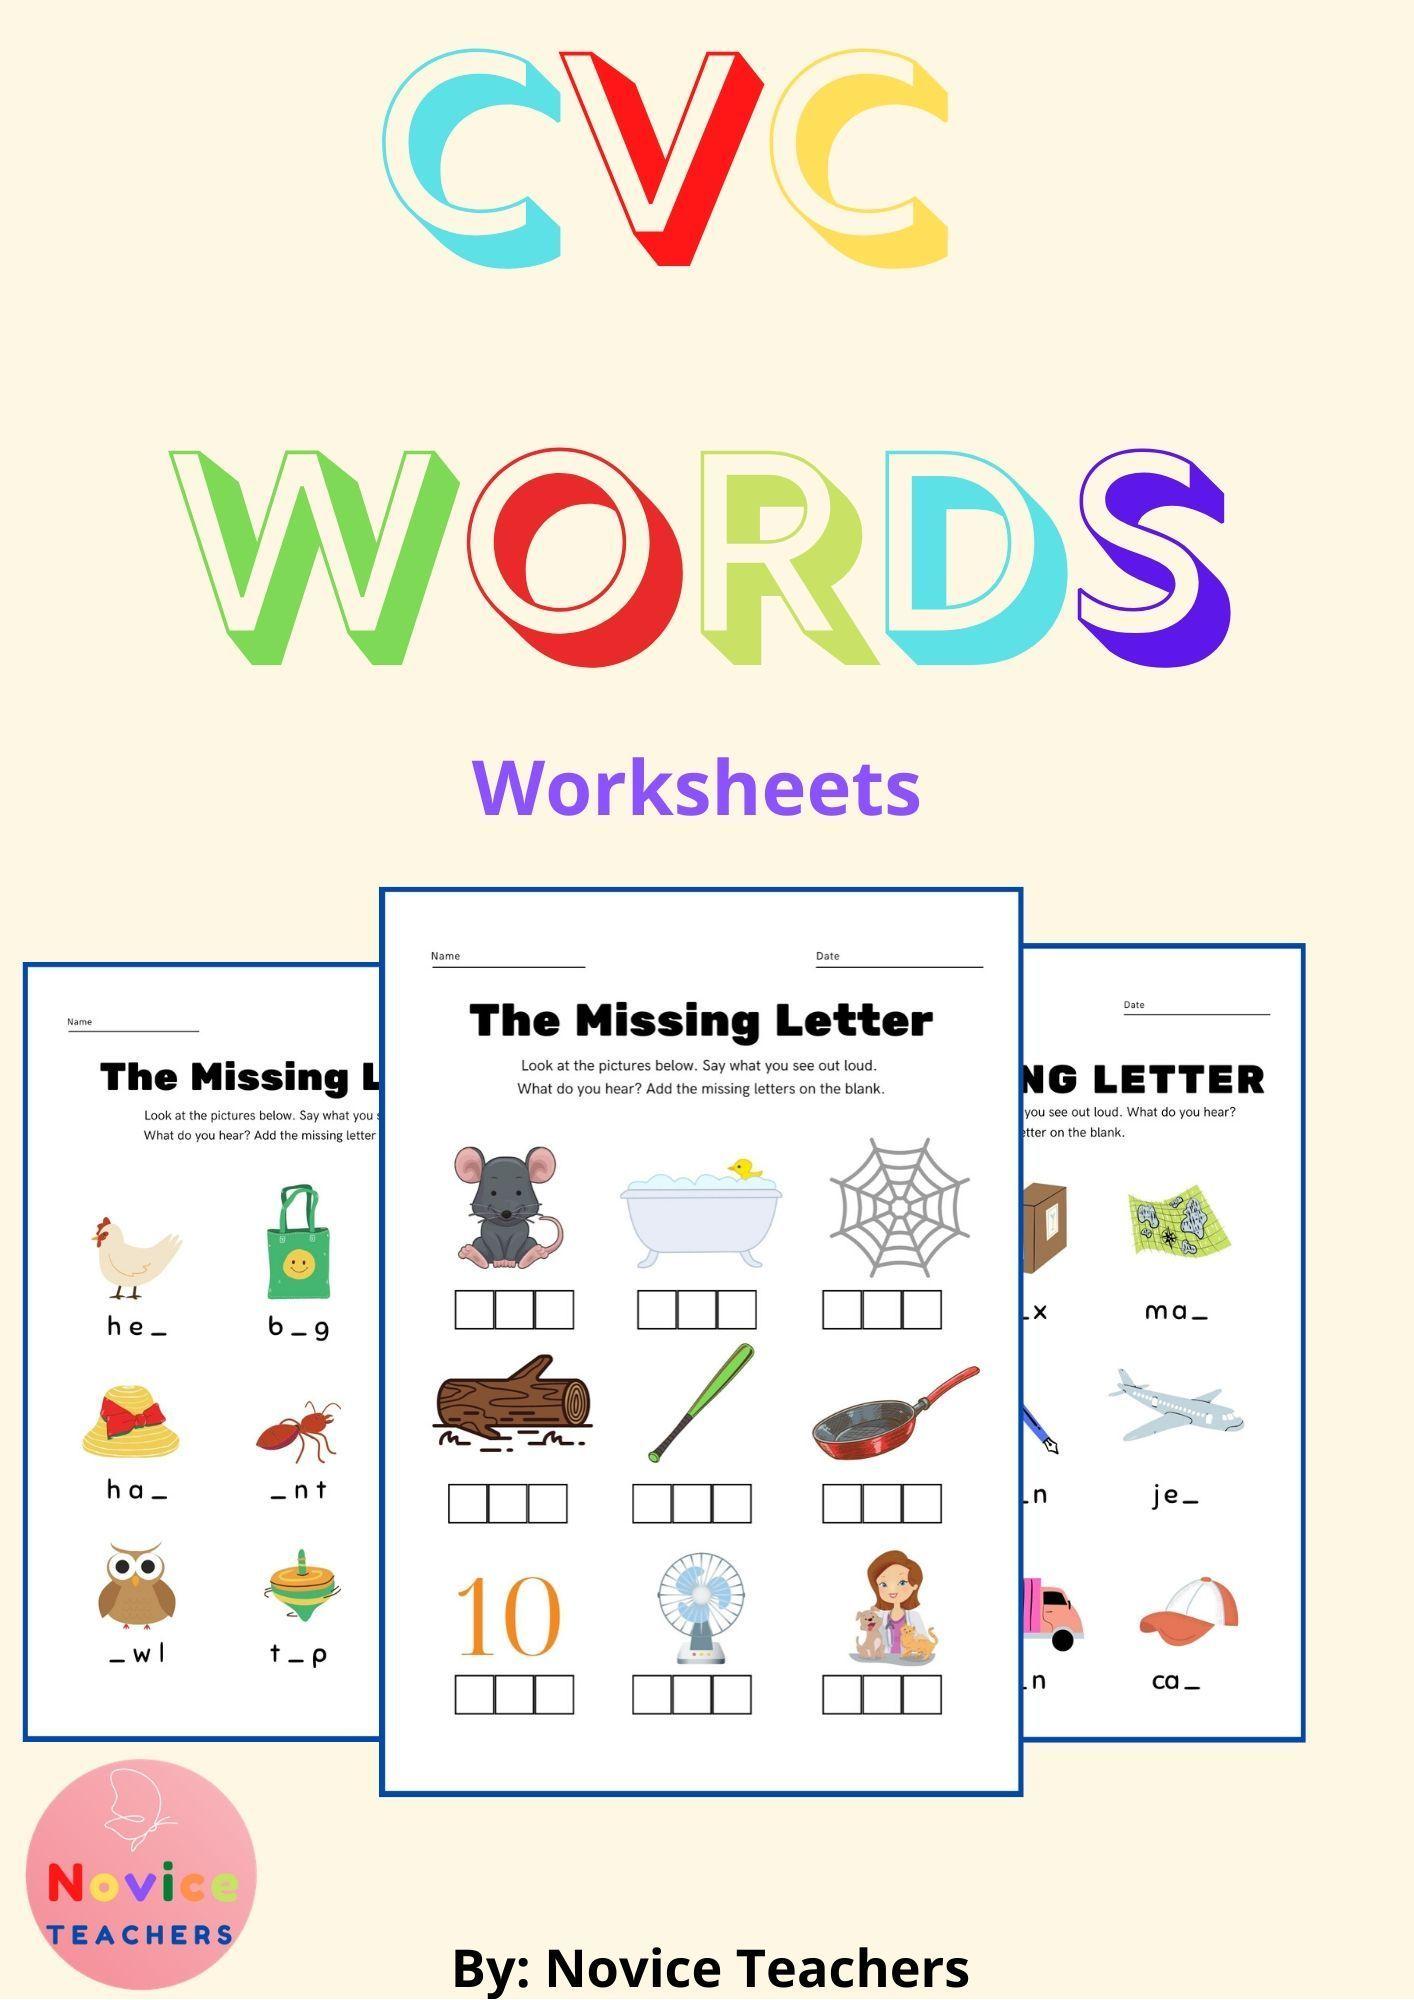 Free Cvc Words Worksheets Cvc Words Cvc Words Worksheets Phonics Printables [ 2000 x 1414 Pixel ]